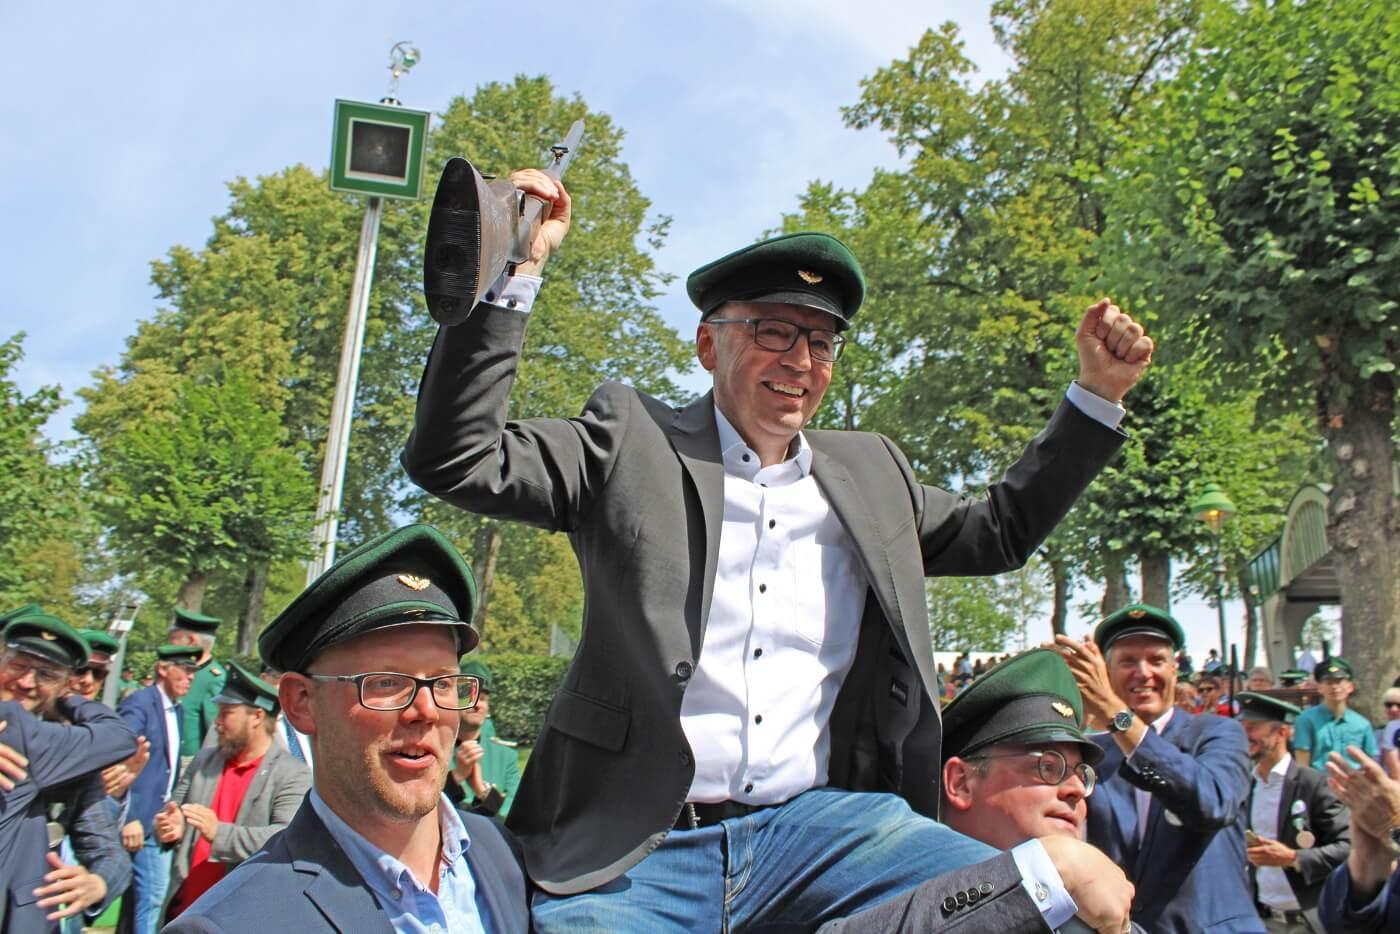 Olper Schützenkönig 2019 Wilhelm Rücker